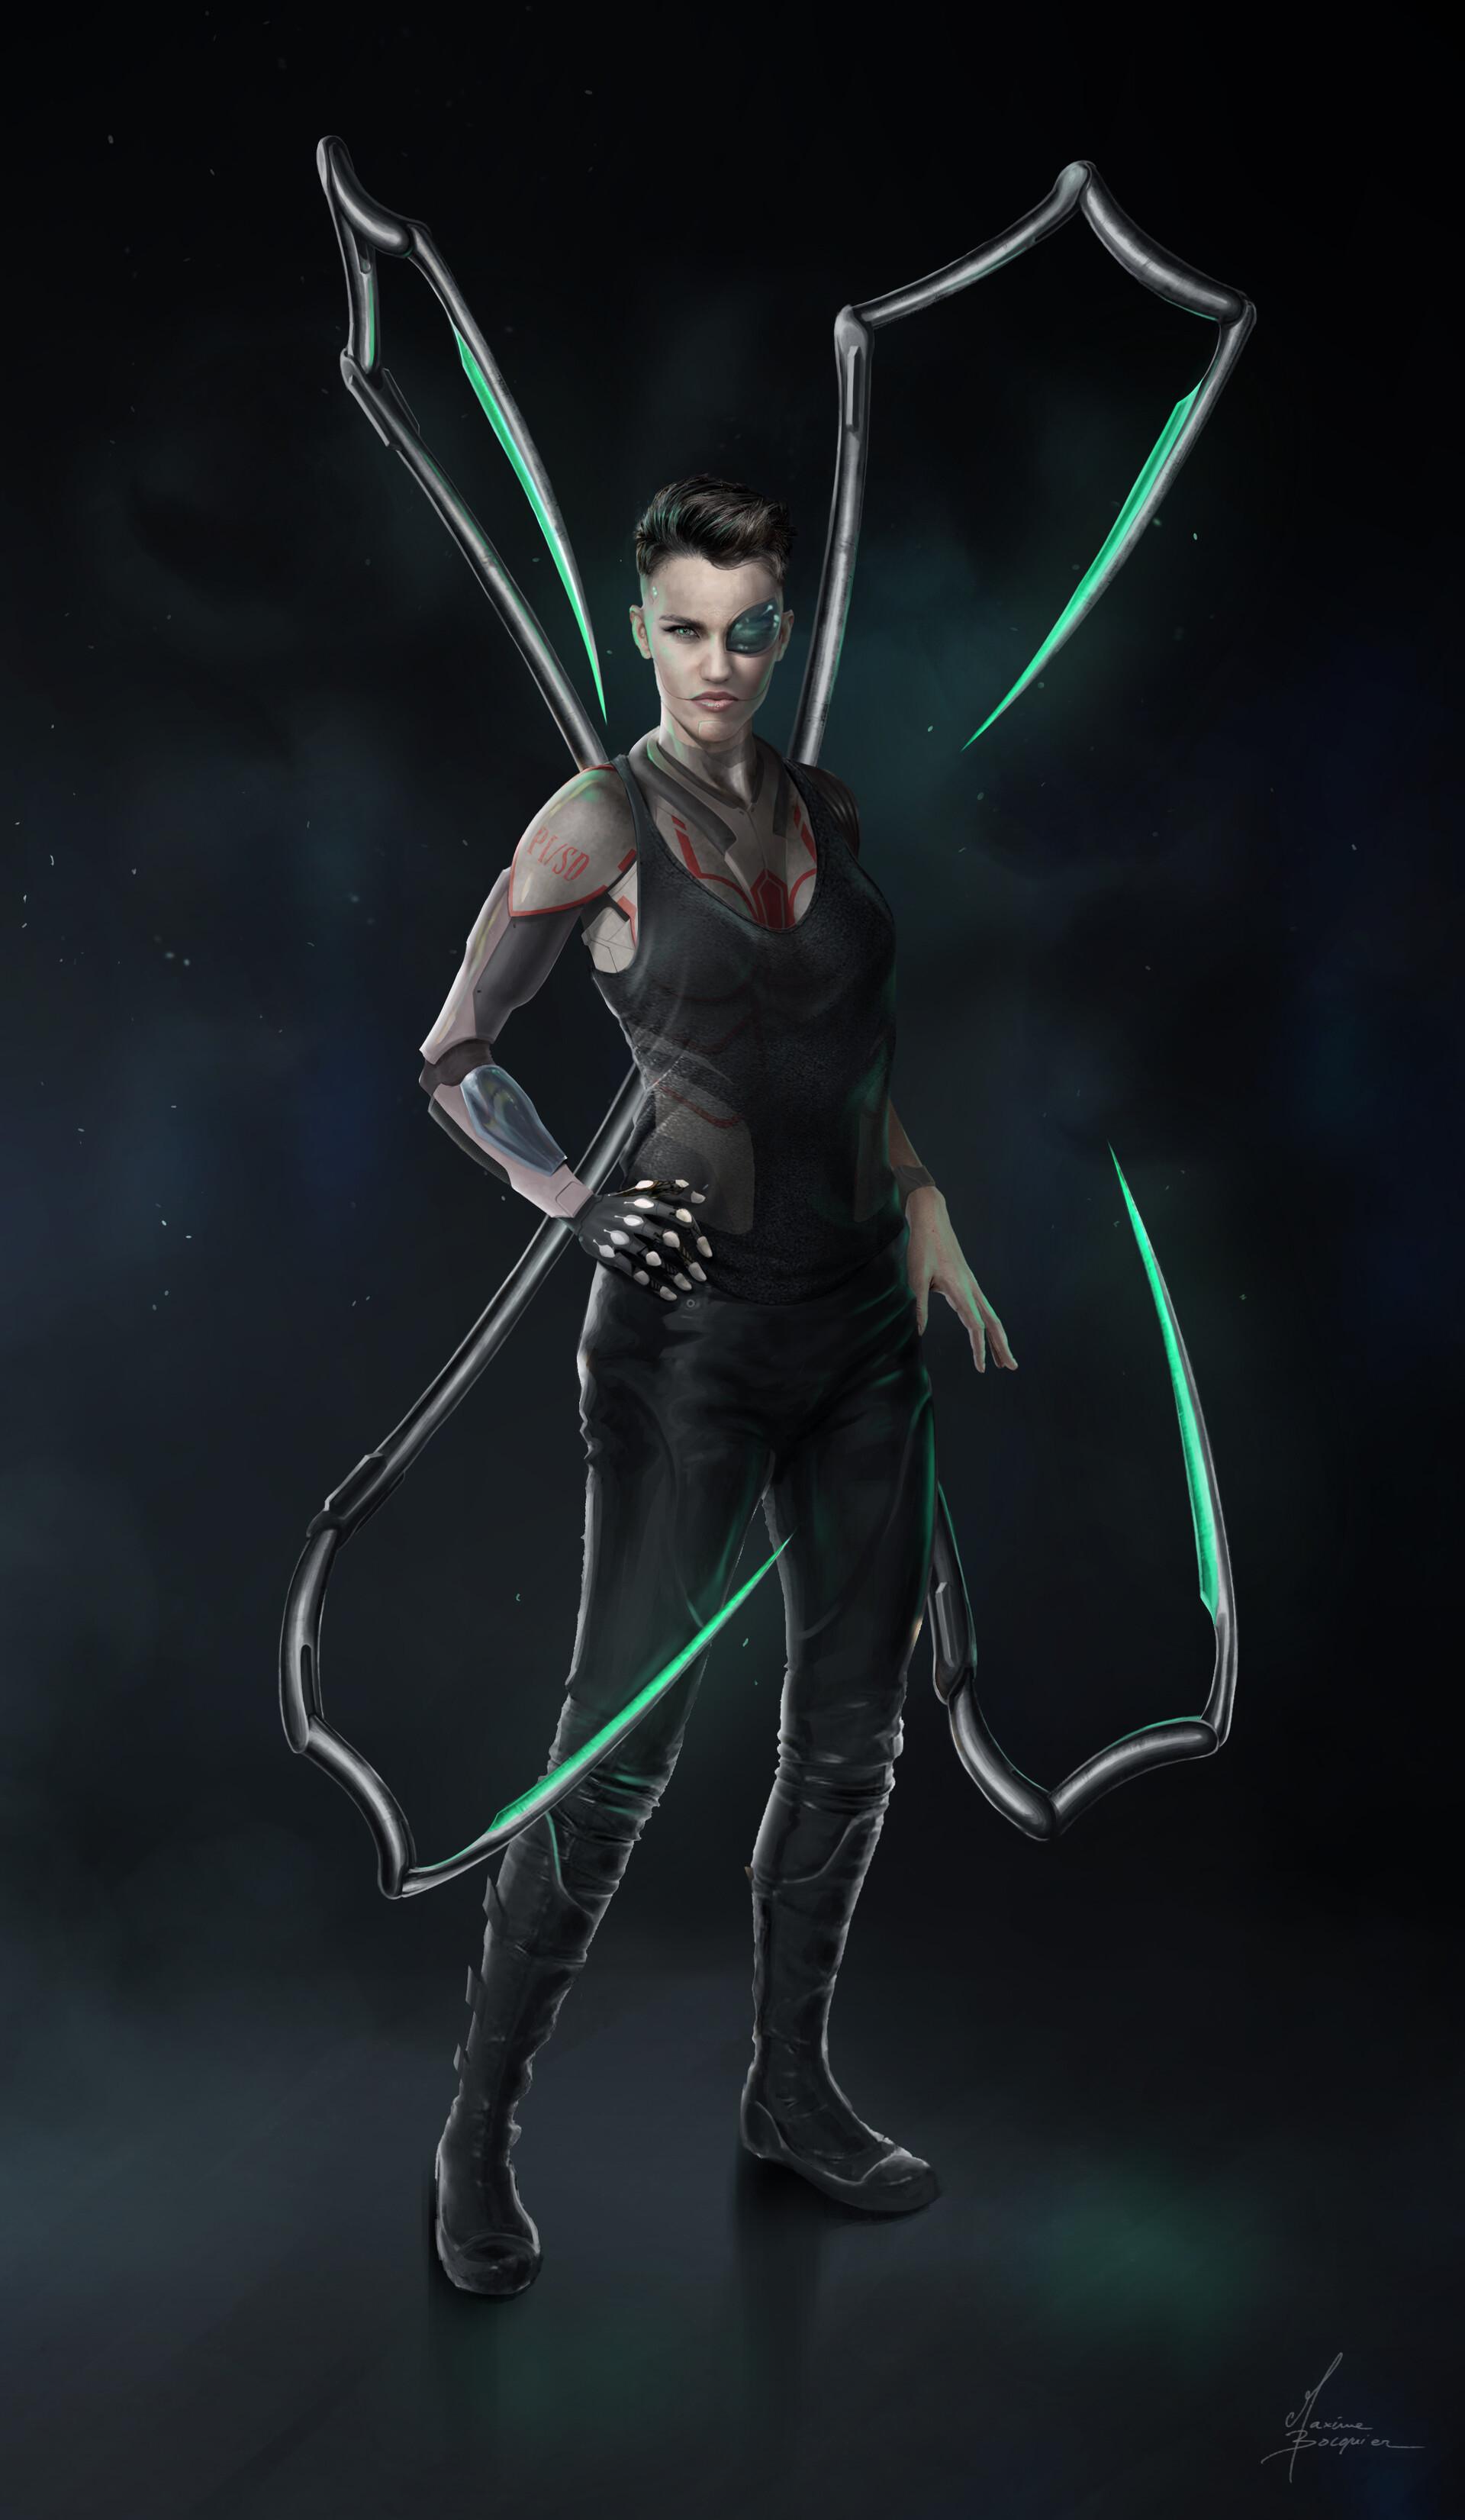 Ruby Rose As Cyberpunk Wallpaper Hd Artist 4k Wallpapers